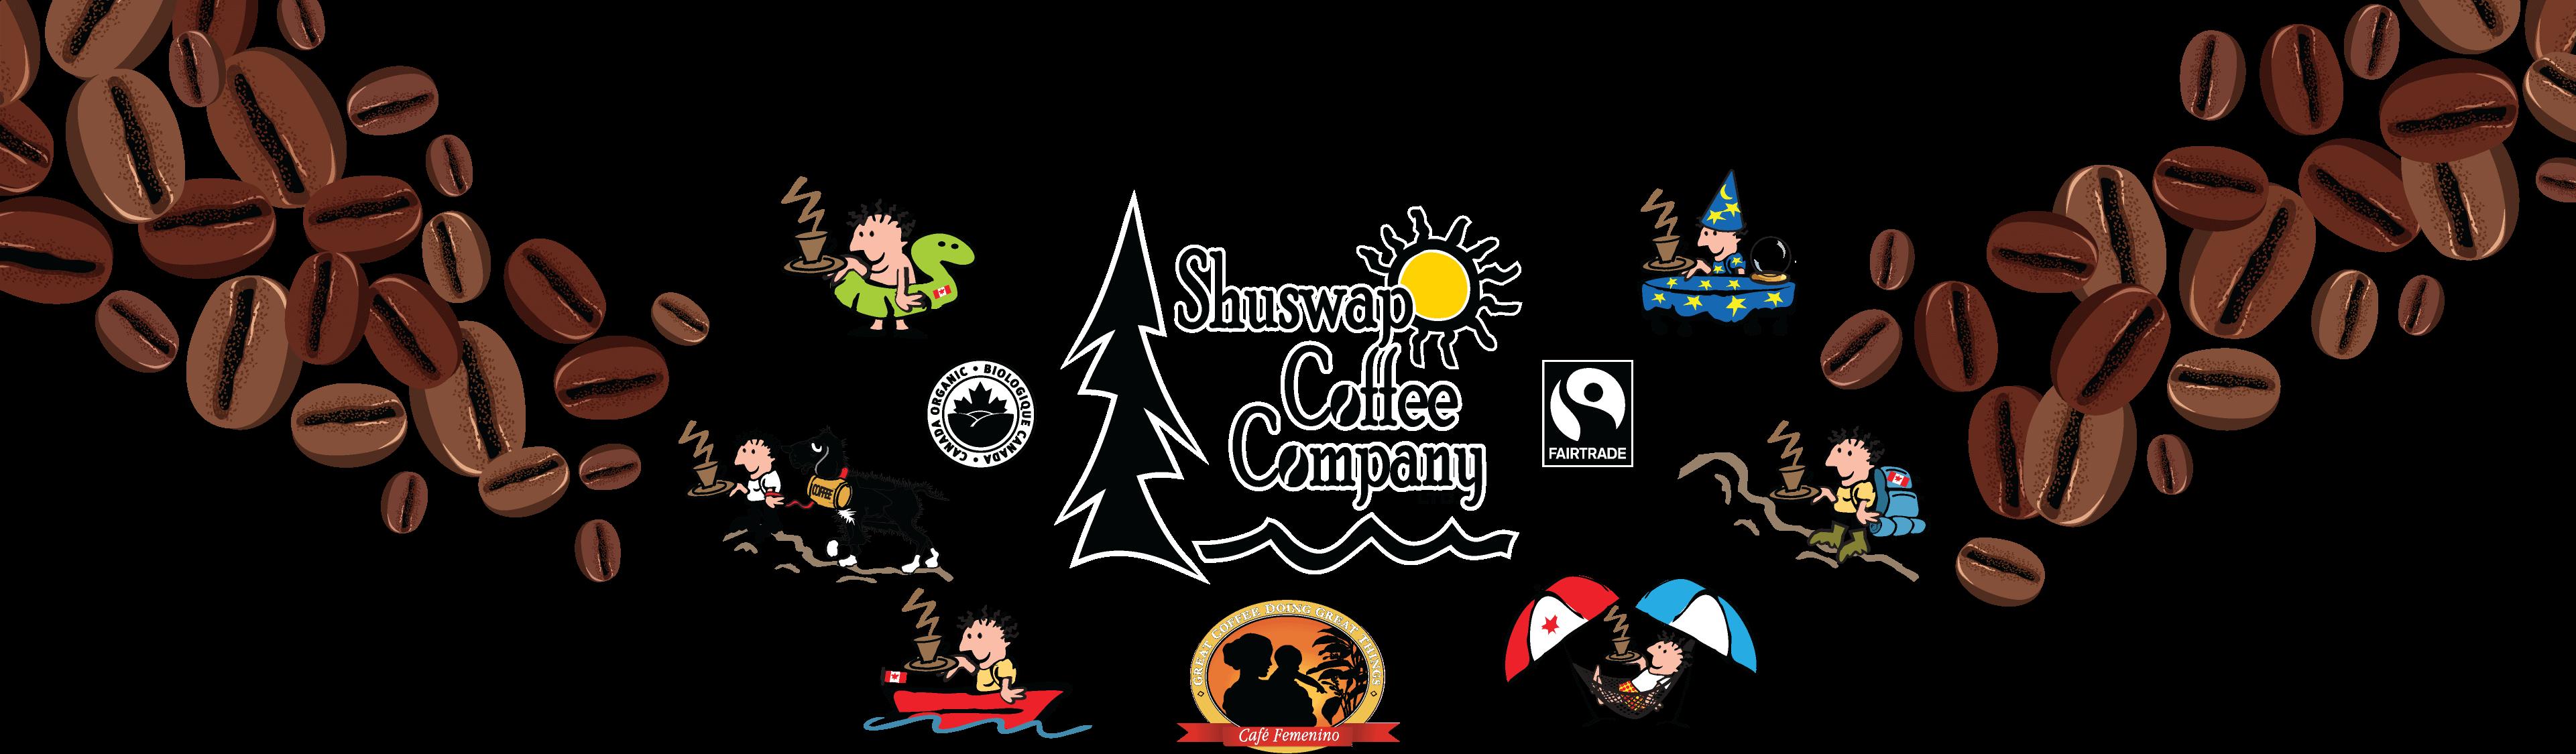 Shuswap Coffee Company Ltd. ~ Organic / Fairtrade / Café Femenino.